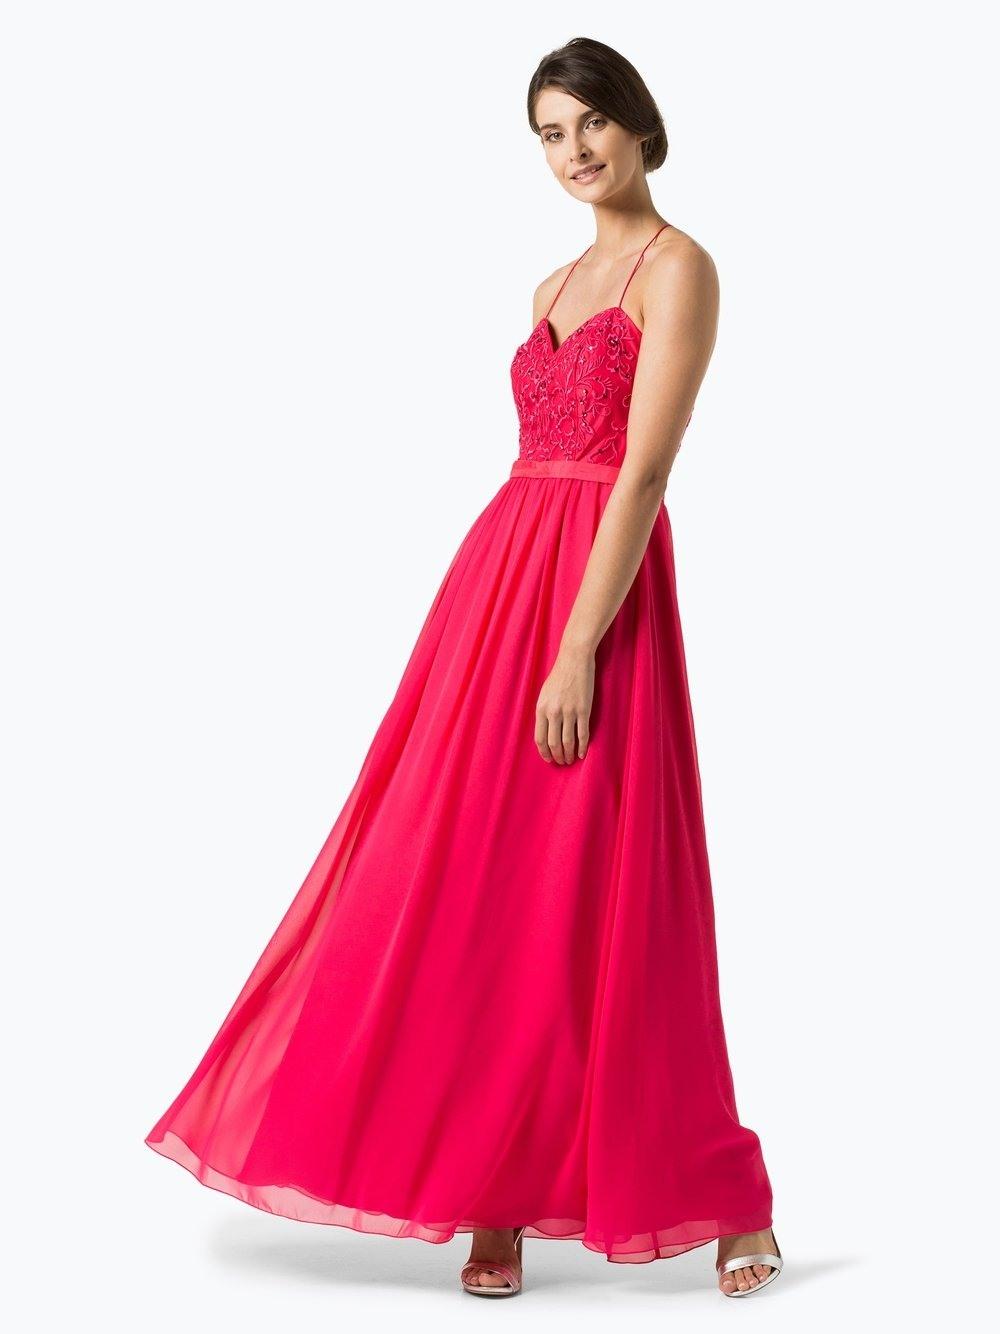 10-genial-abendkleid-pink-spezialgebiet